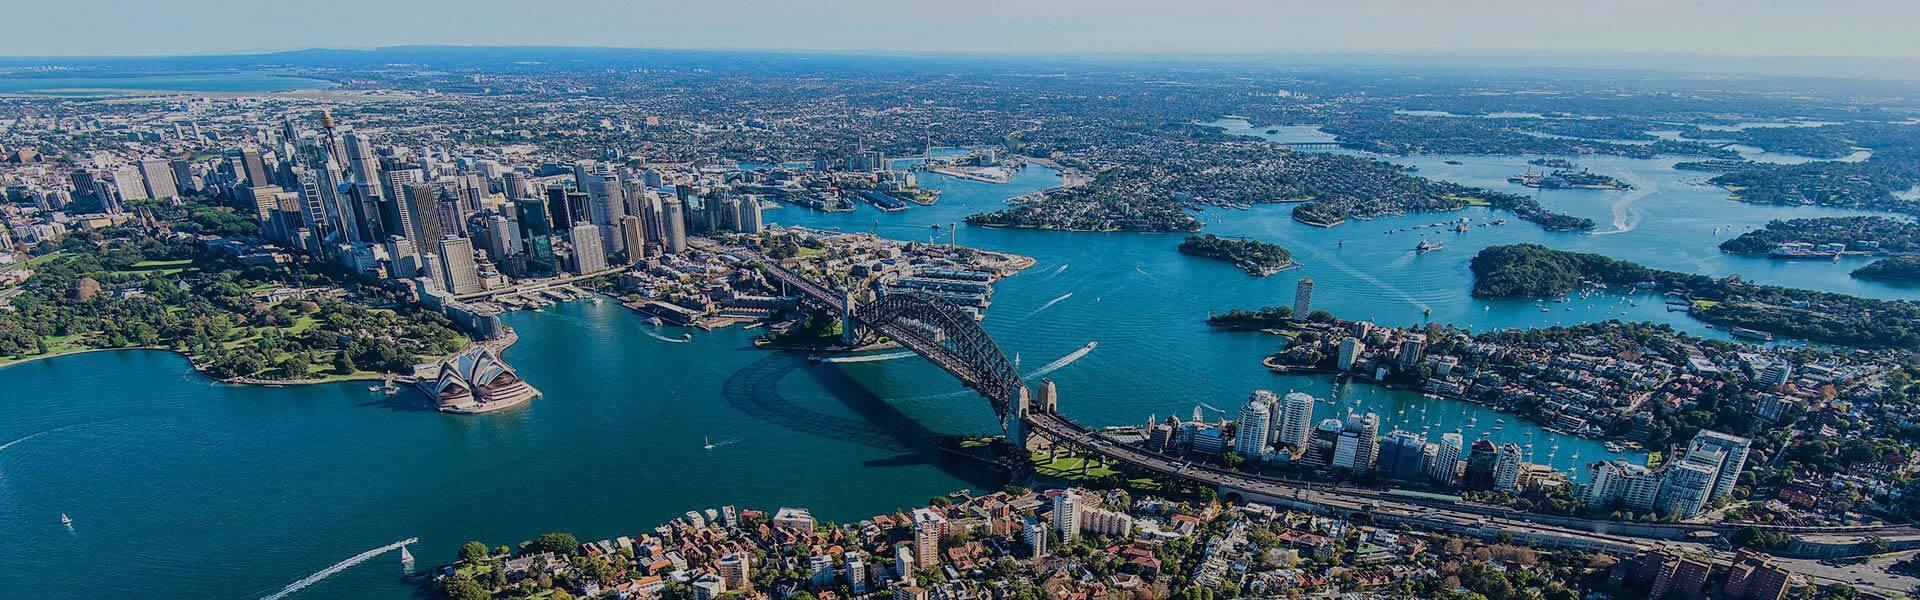 Sydney Harour skyline